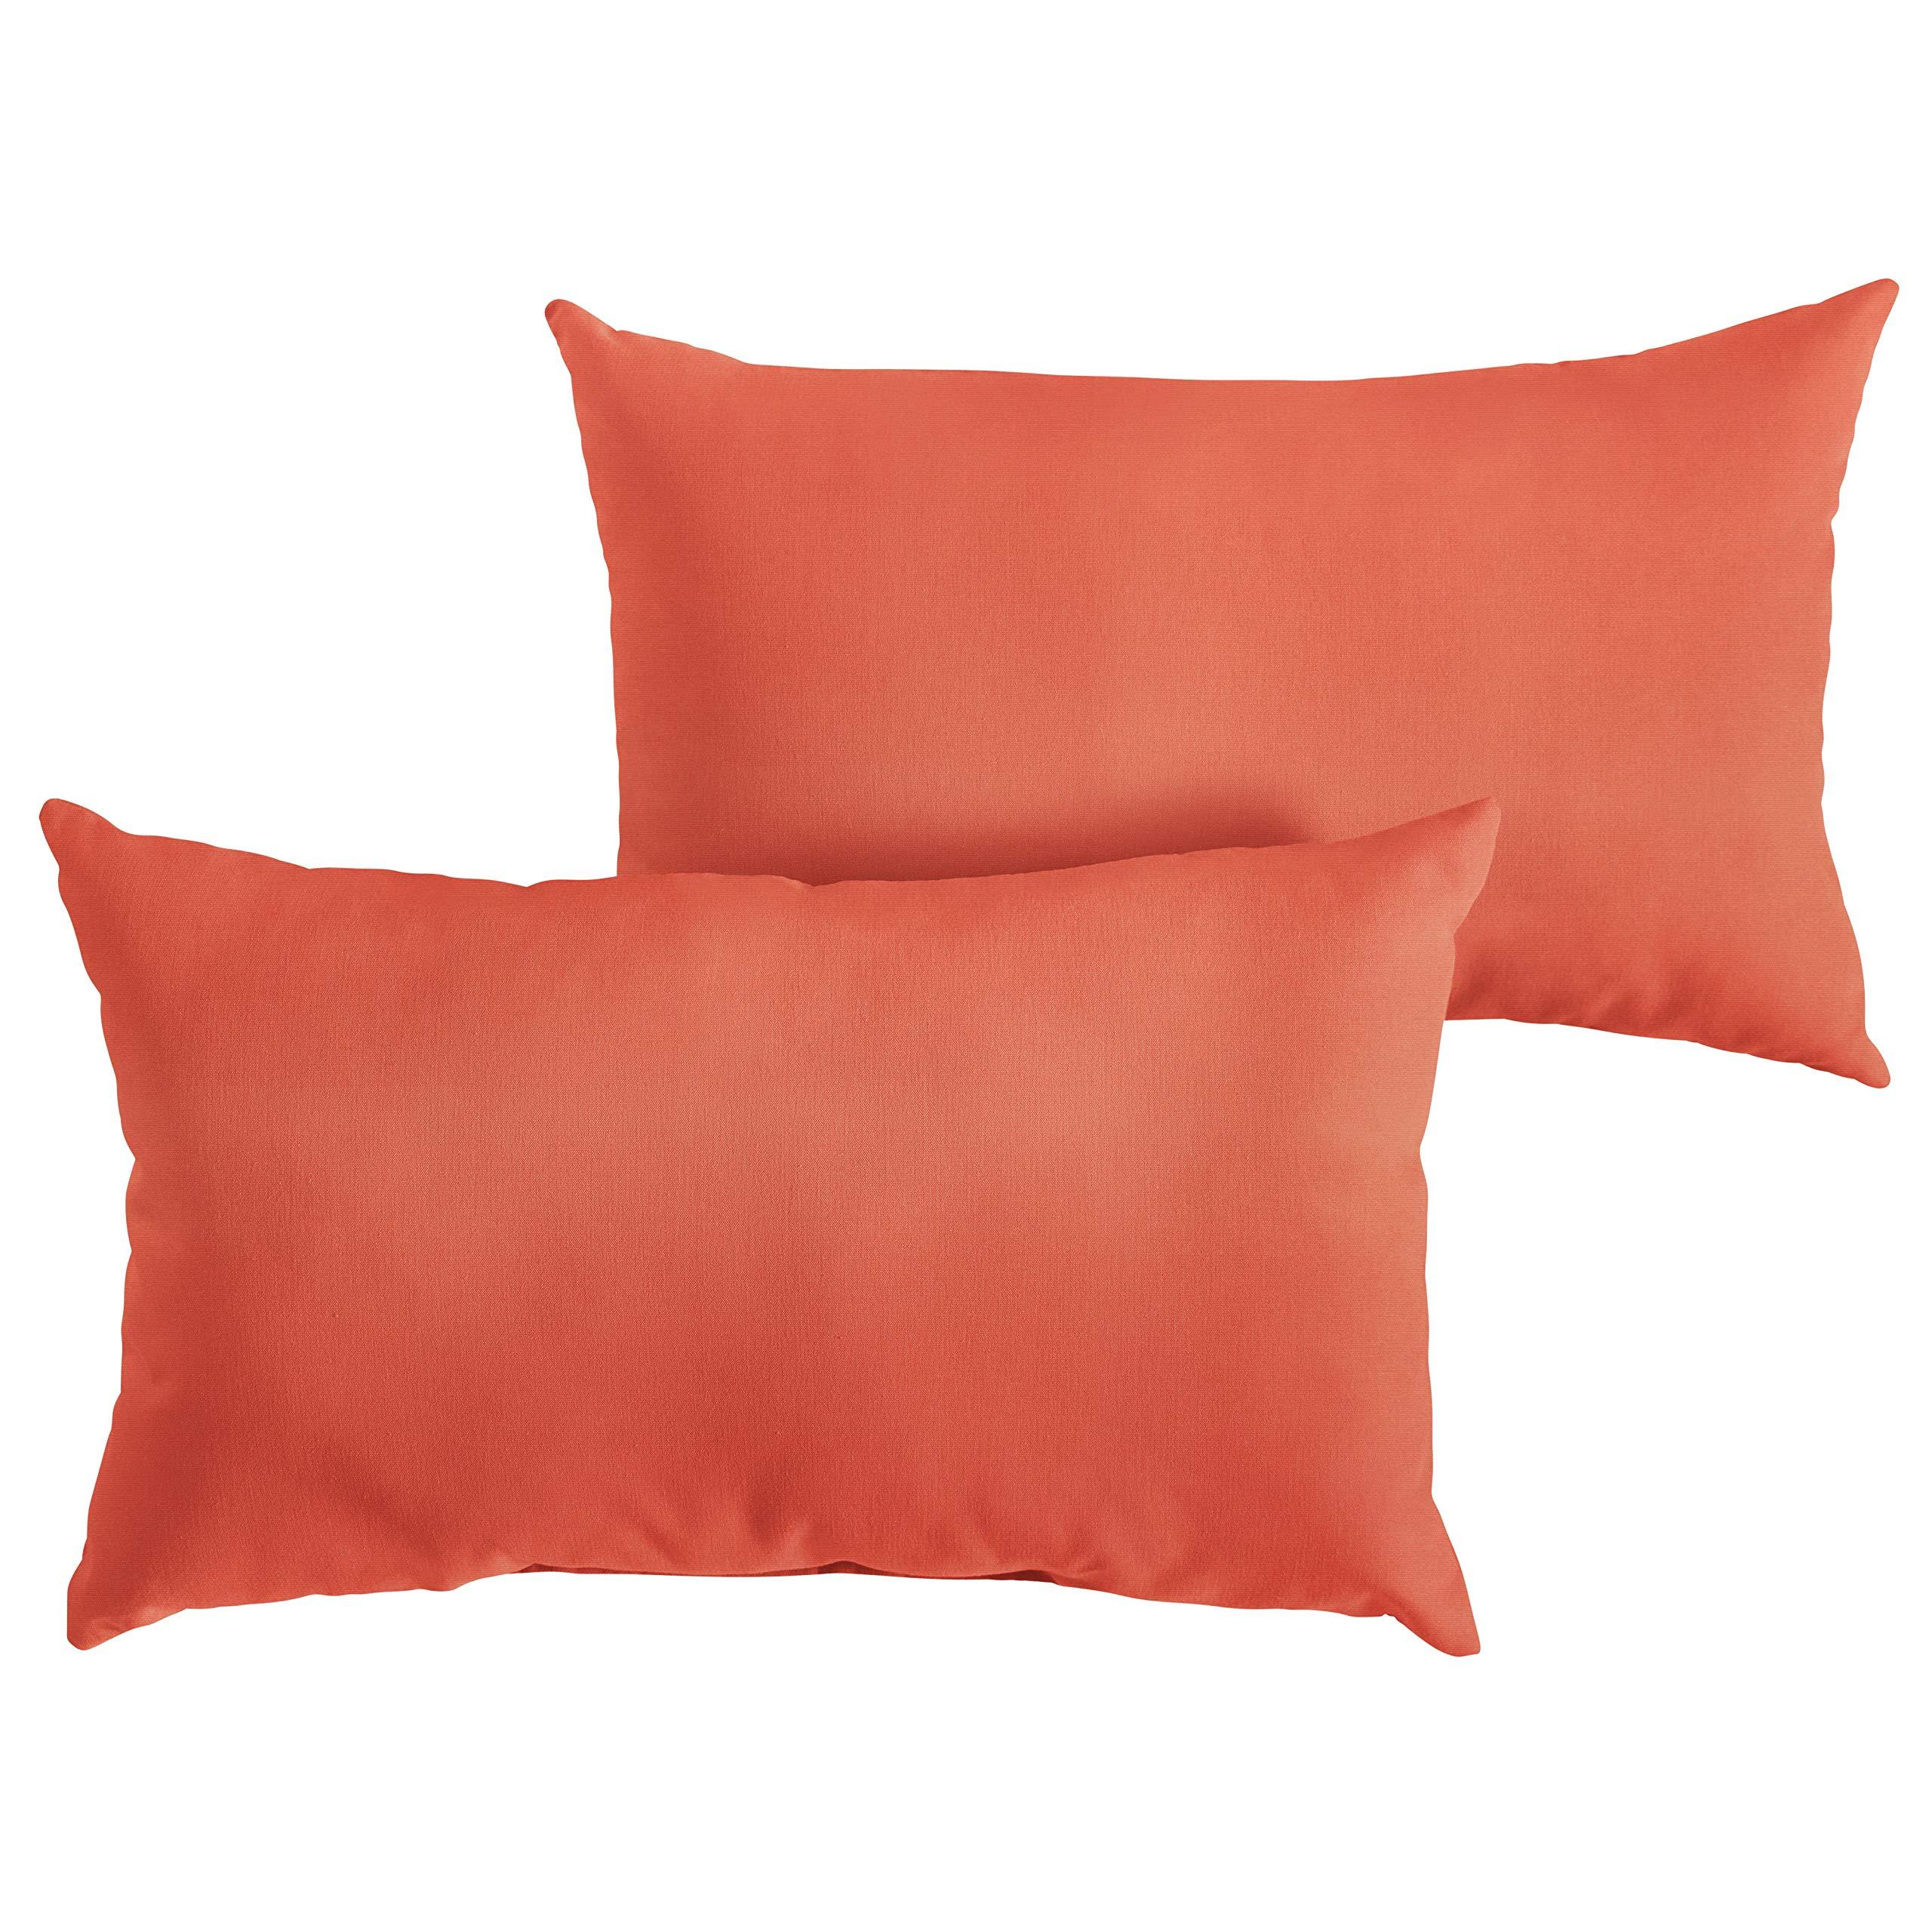 1101Design Sunbrella Canvas Melon Knife Edge Decorative Indoor/Outdoor Rectangle Lumbar Pillow, Perfect for Patio Decor - Melon Orange 14'' x 24'' (Set of 2)